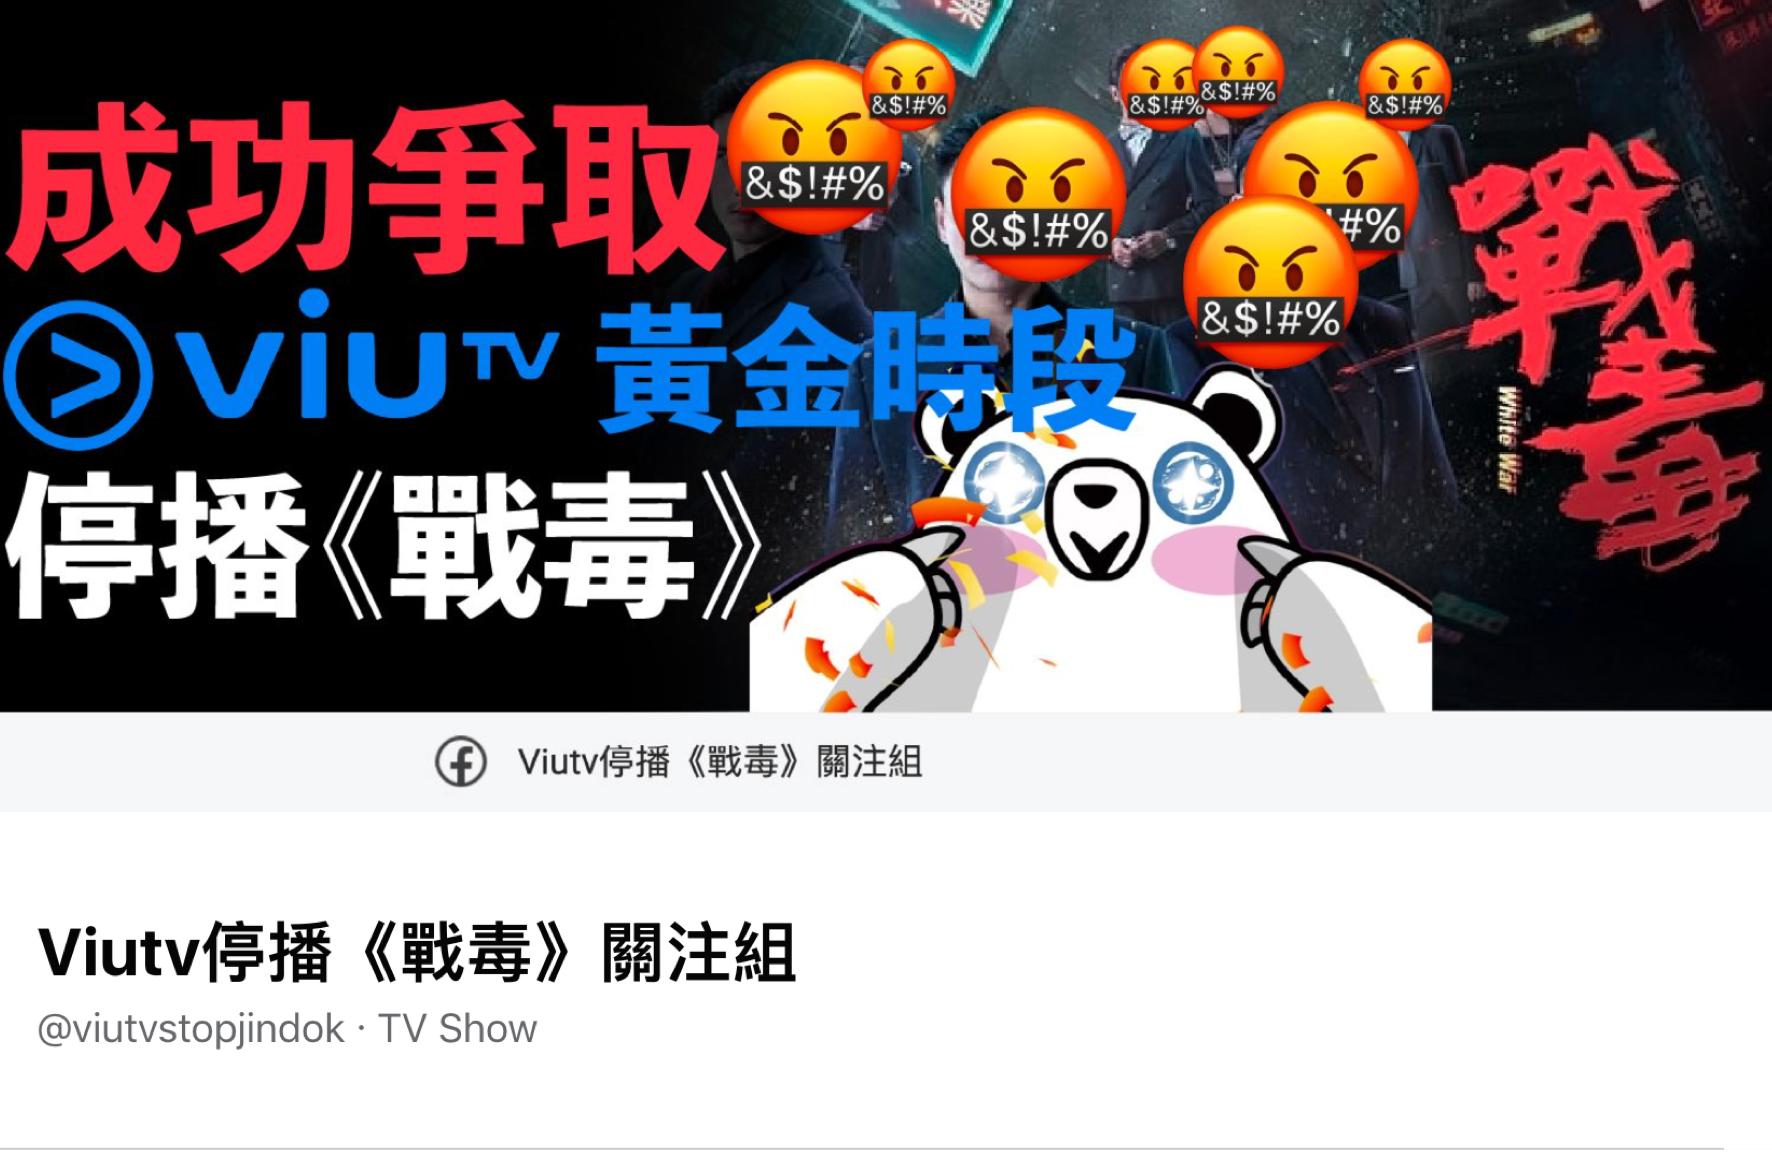 「ViuTV停播《戰毒》關注組」專頁呼籲杯葛和罷睇《戰毒》,以及到ViuTV的專頁留言和按下「嬲嬲」的表情。(ViuTV停播《戰毒》關注組 Facebook專頁截圖)